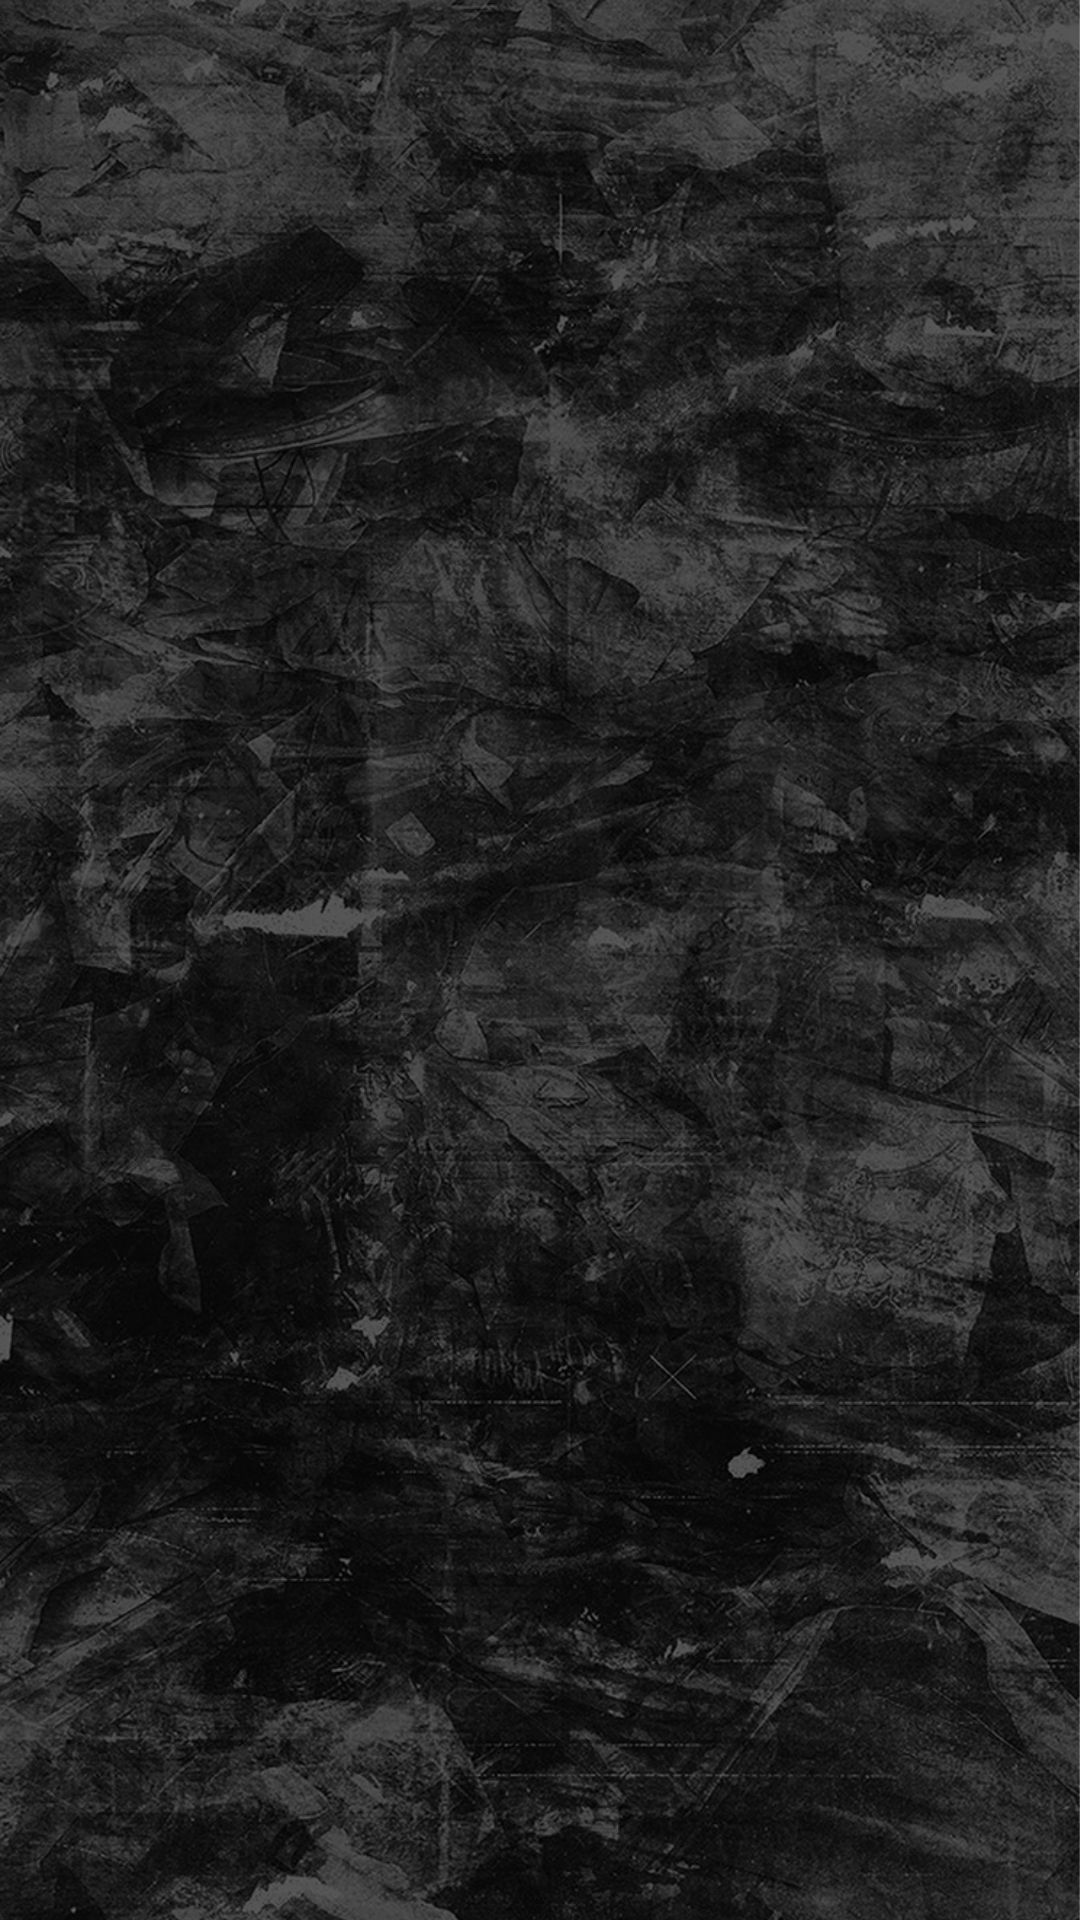 Wonder Art Illust Grunge Abstract Black Iphone 7 Wallpaper Iphone 6 Plus Wallpaper Abstract Iphone Wallpaper Black Phone Wallpaper